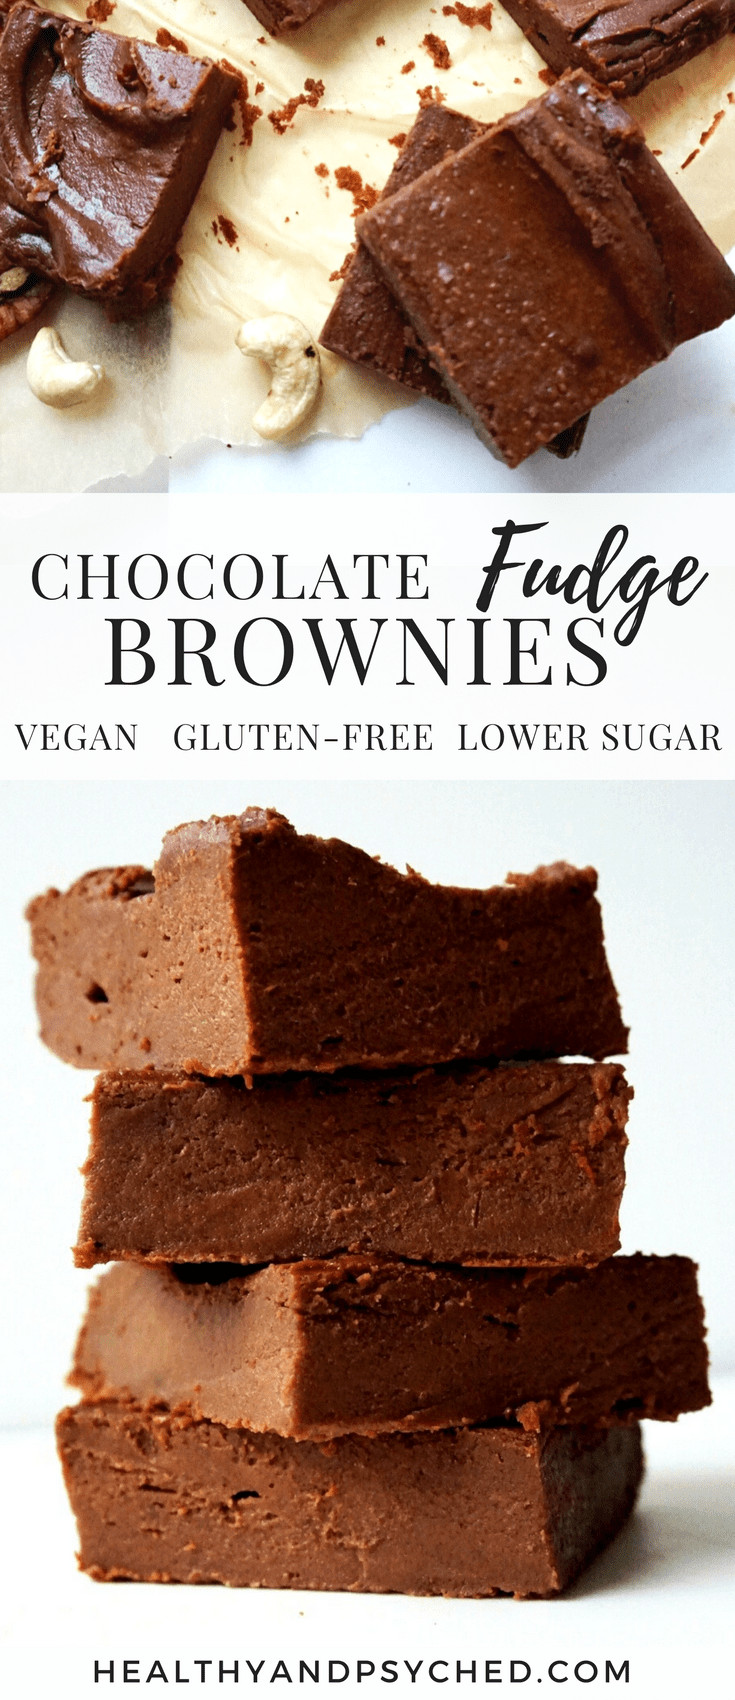 Vegan Fudge Brownies  Chocolate Fudge Brownie Recipe Vegan Gluten Free